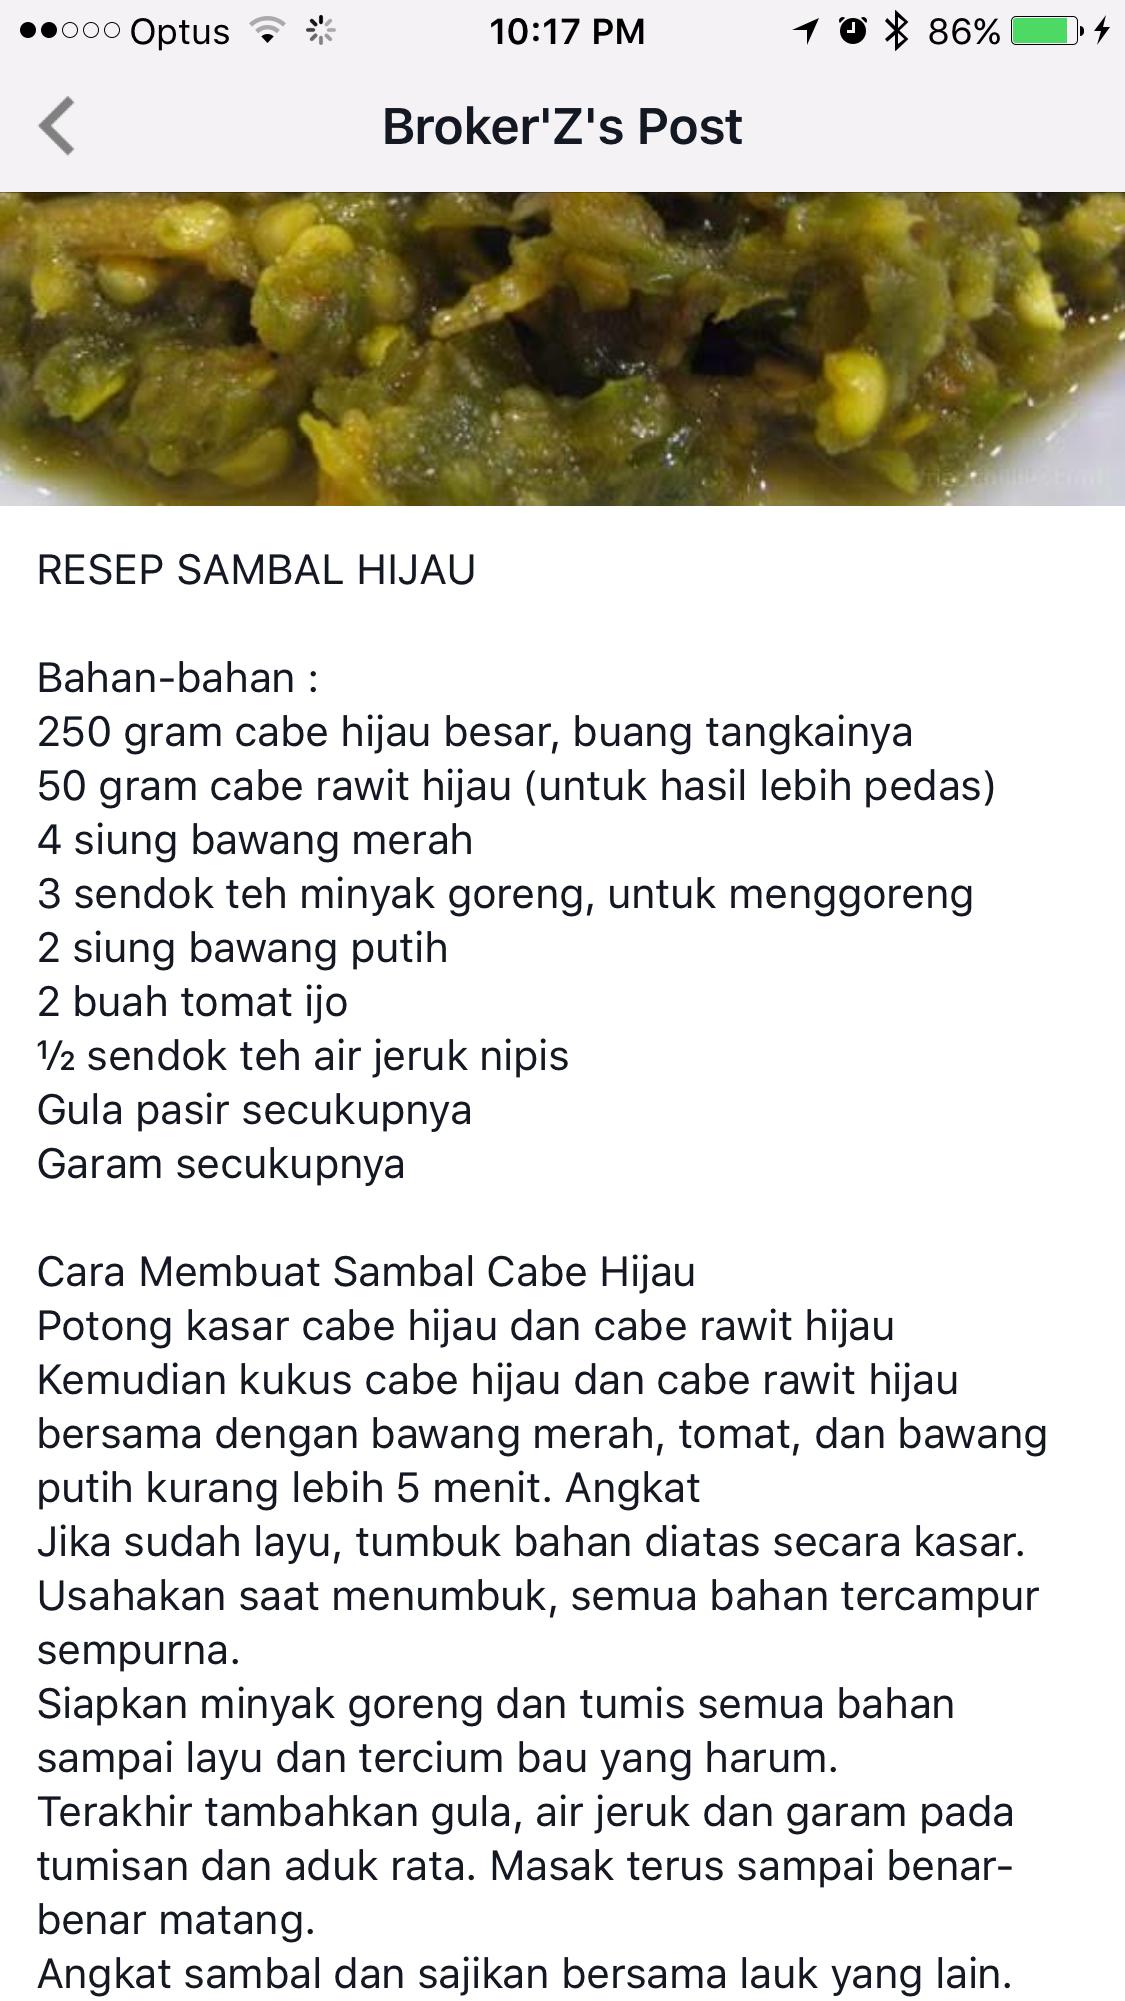 Pin By Giok Ay On Resep Aneka Sambal Pinterest Recipes Minyak Ijo Hijau